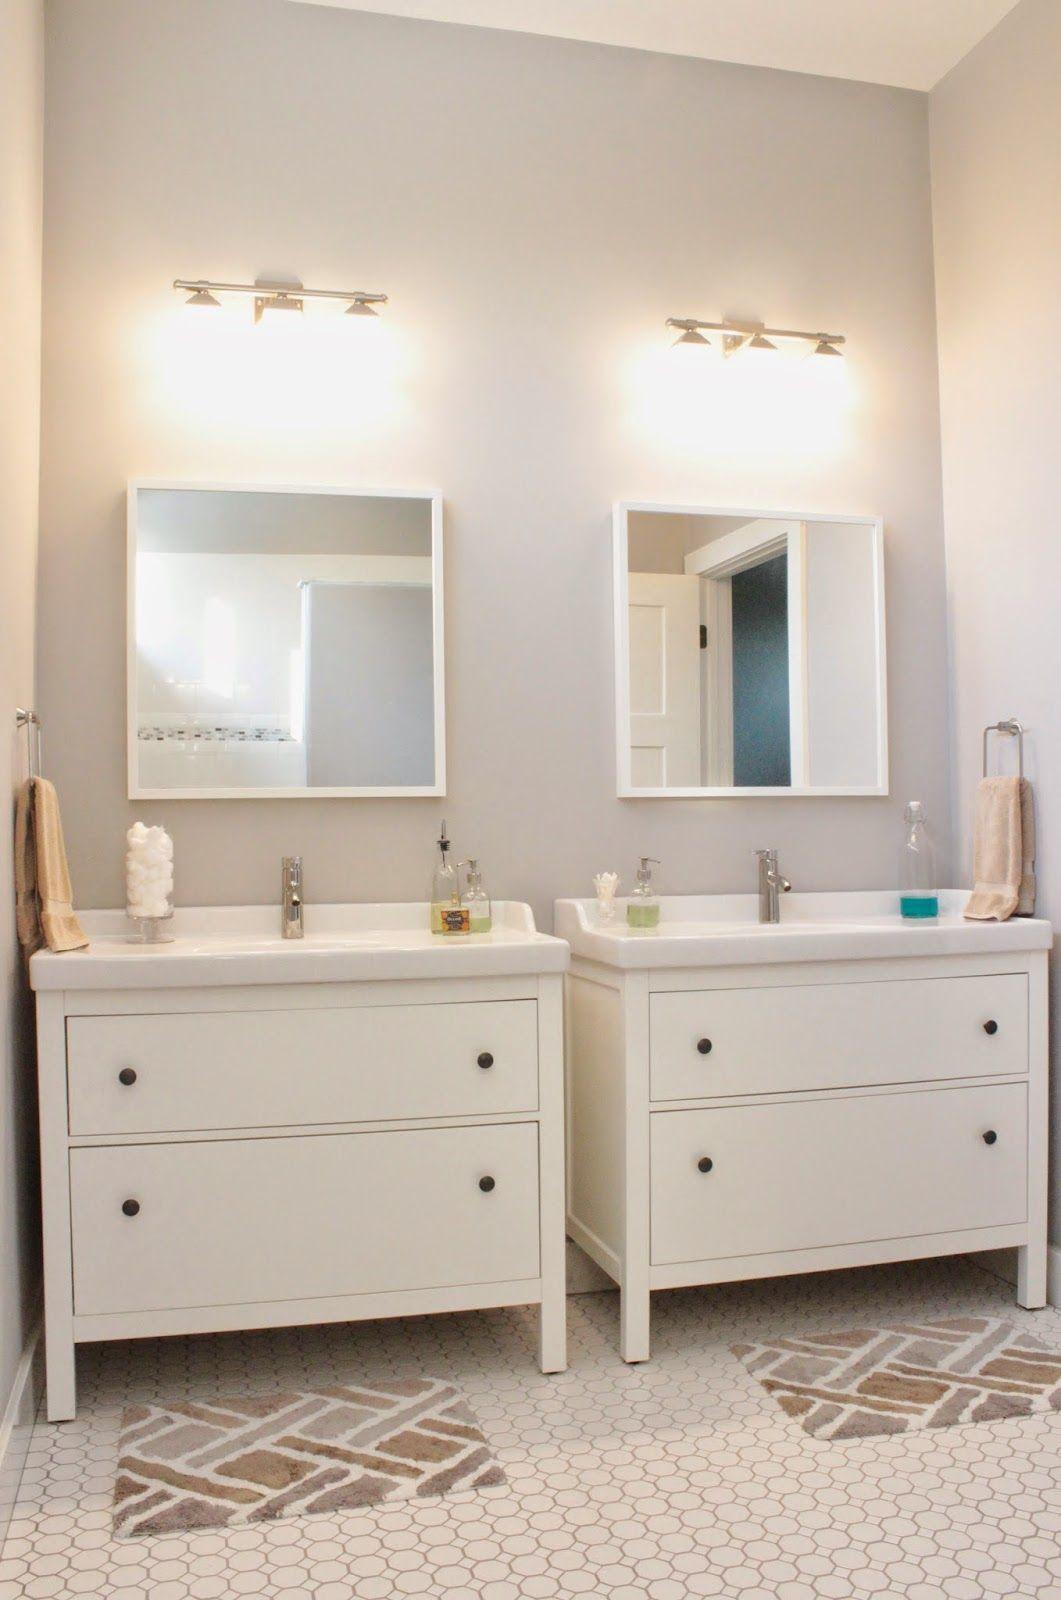 room by room master bathroom Double vanity bathroom